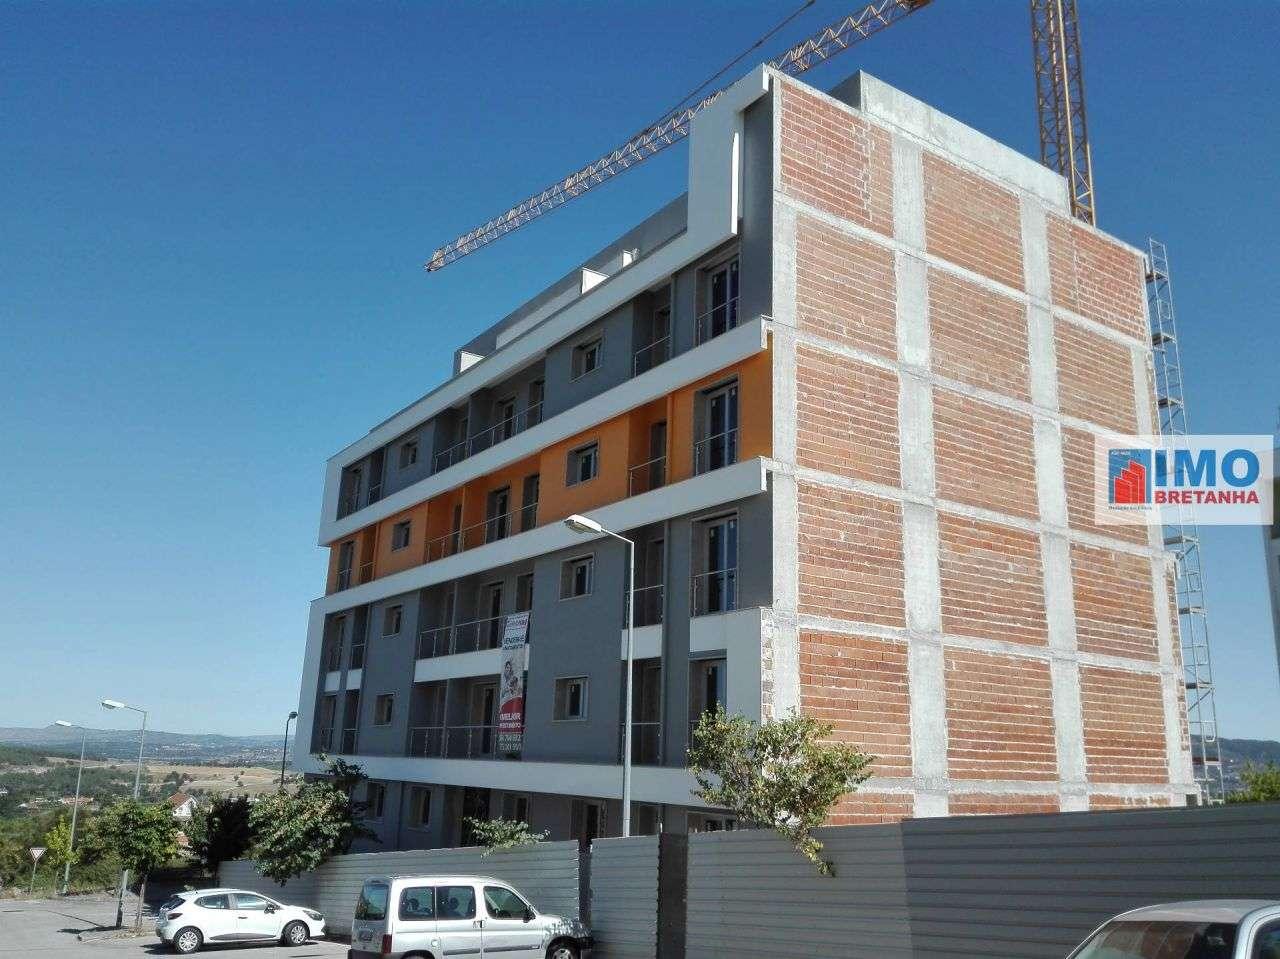 Apartamento para comprar, Covilhã e Canhoso, Covilhã, Castelo Branco - Foto 3